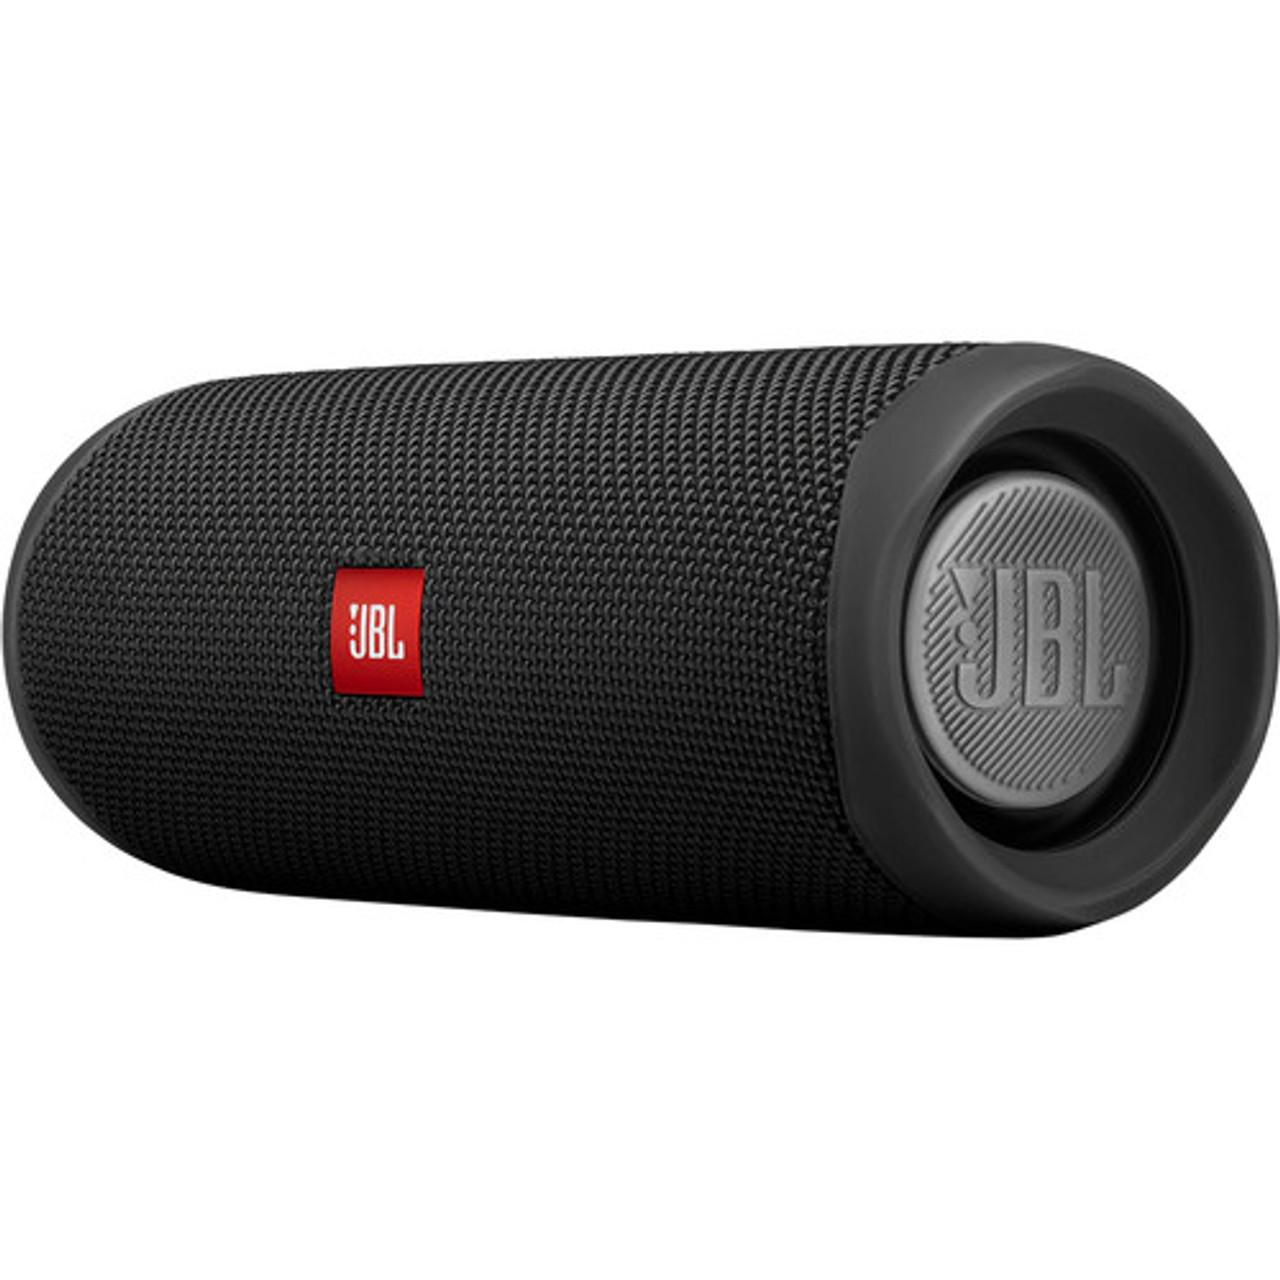 Jbl Flip 5 Waterproof Bluetooth Speaker Midnight Black Esurebuy Com